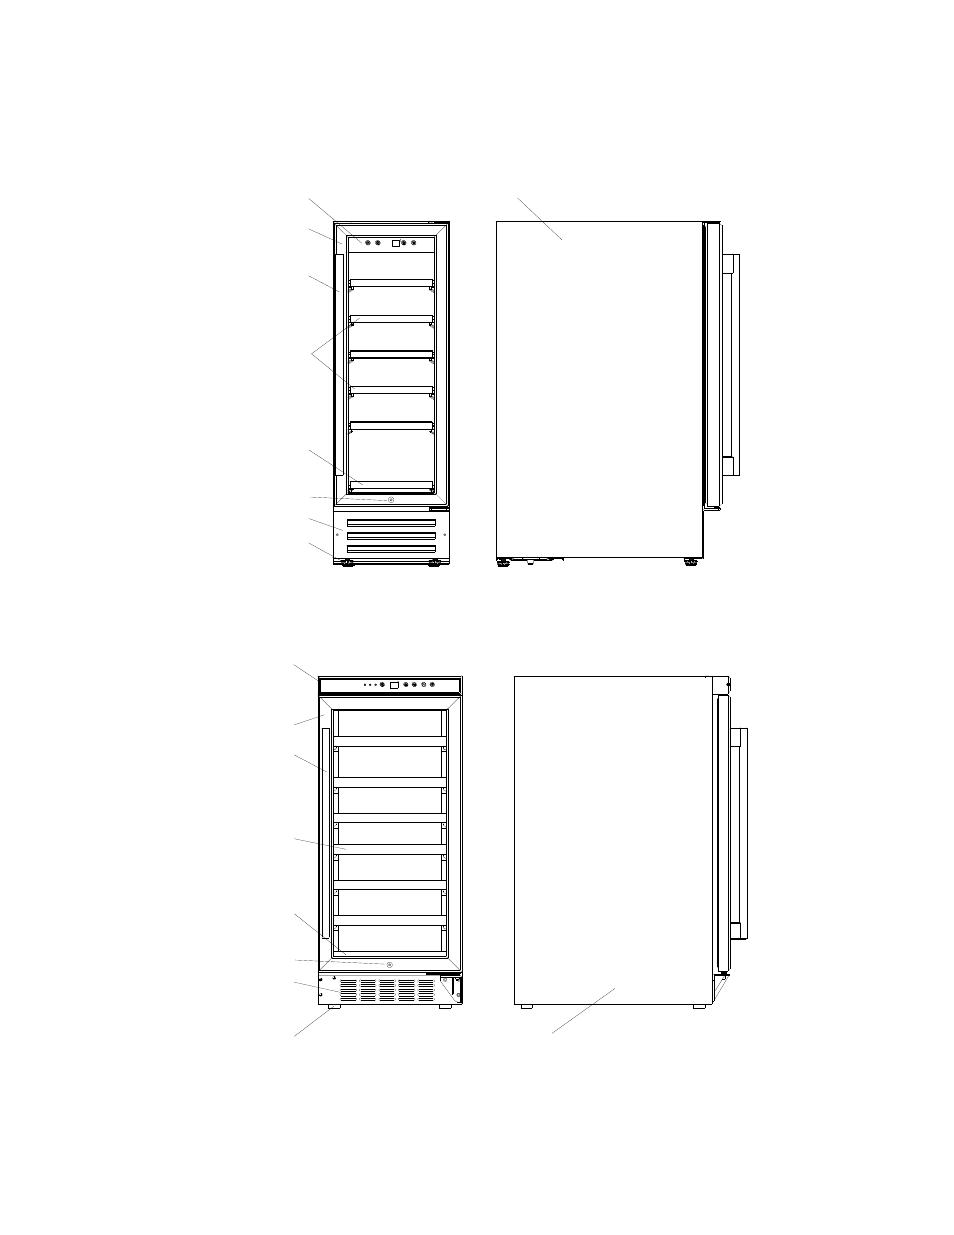 Parts & features, Model bwr-18sd 18 bottle wine